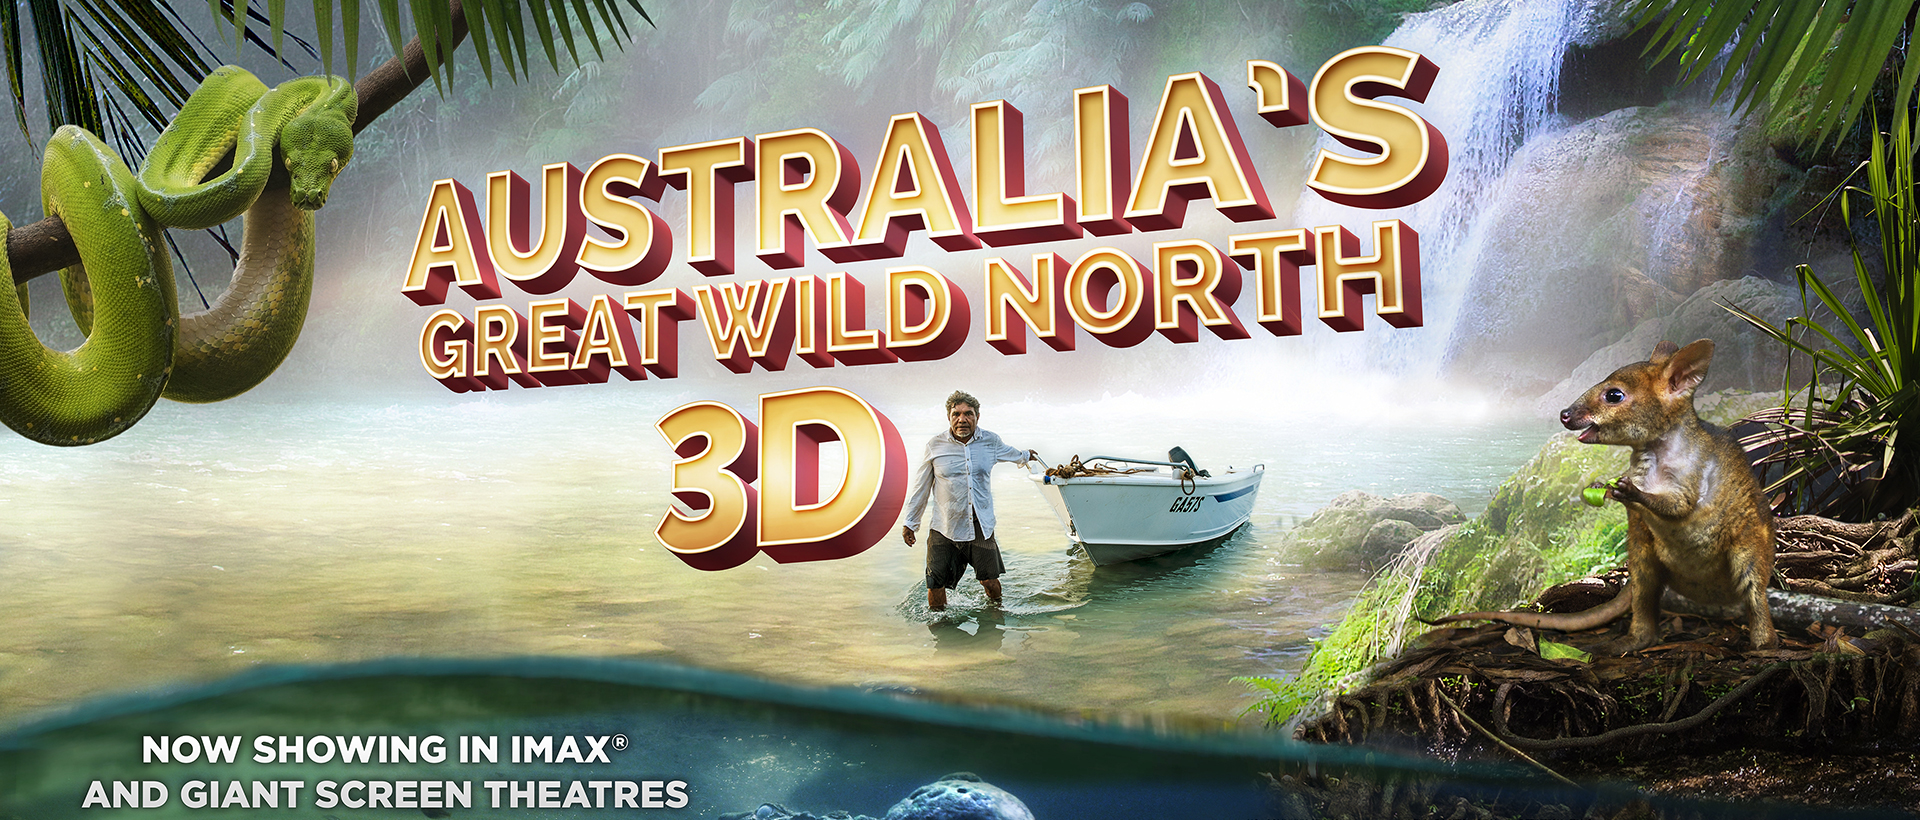 Australia's Great Wild North 3D movie poster